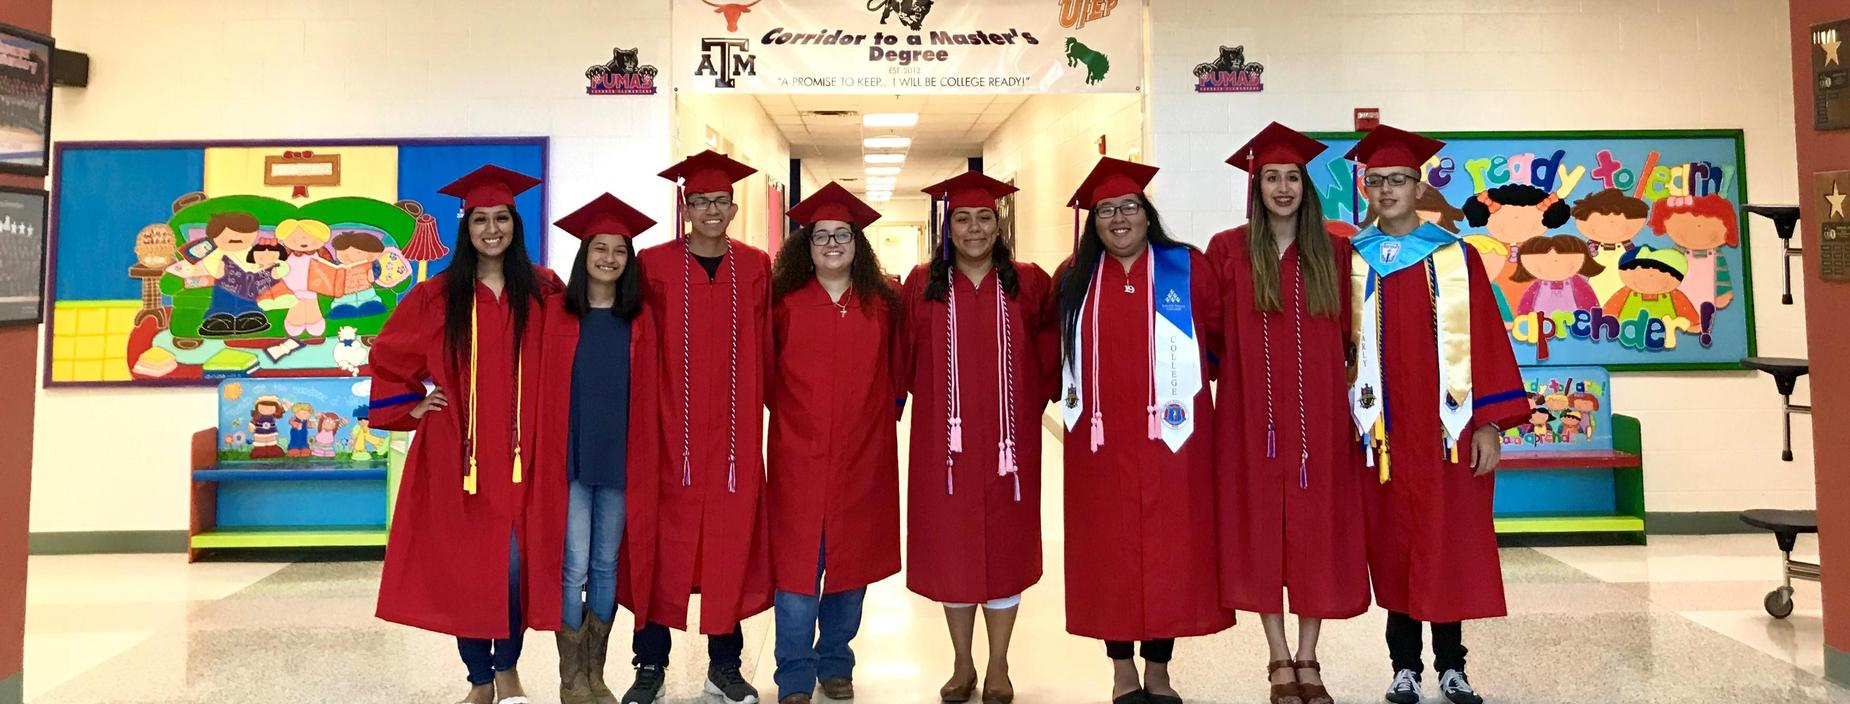 2019 Puma Graduates